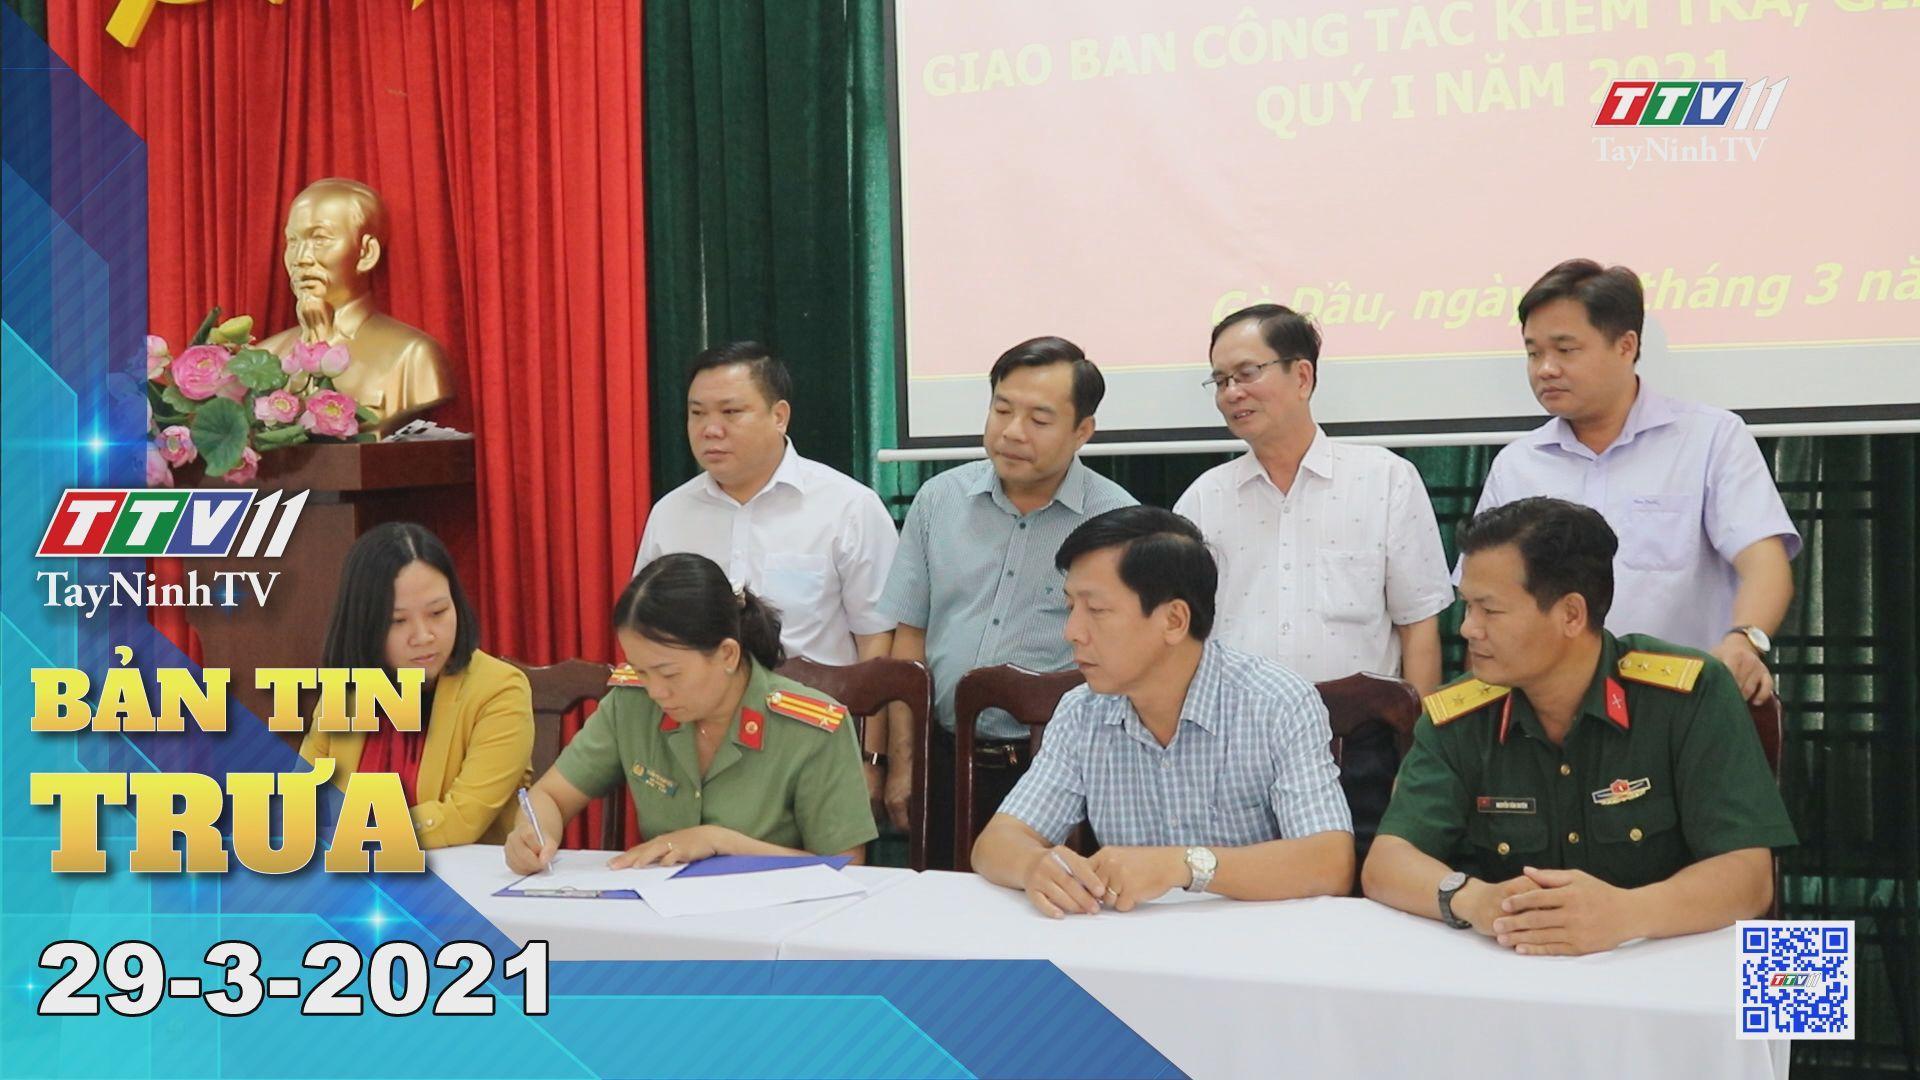 Bản tin trưa 29-3-2021 | Tin tức hôm nay | TayNinhTV